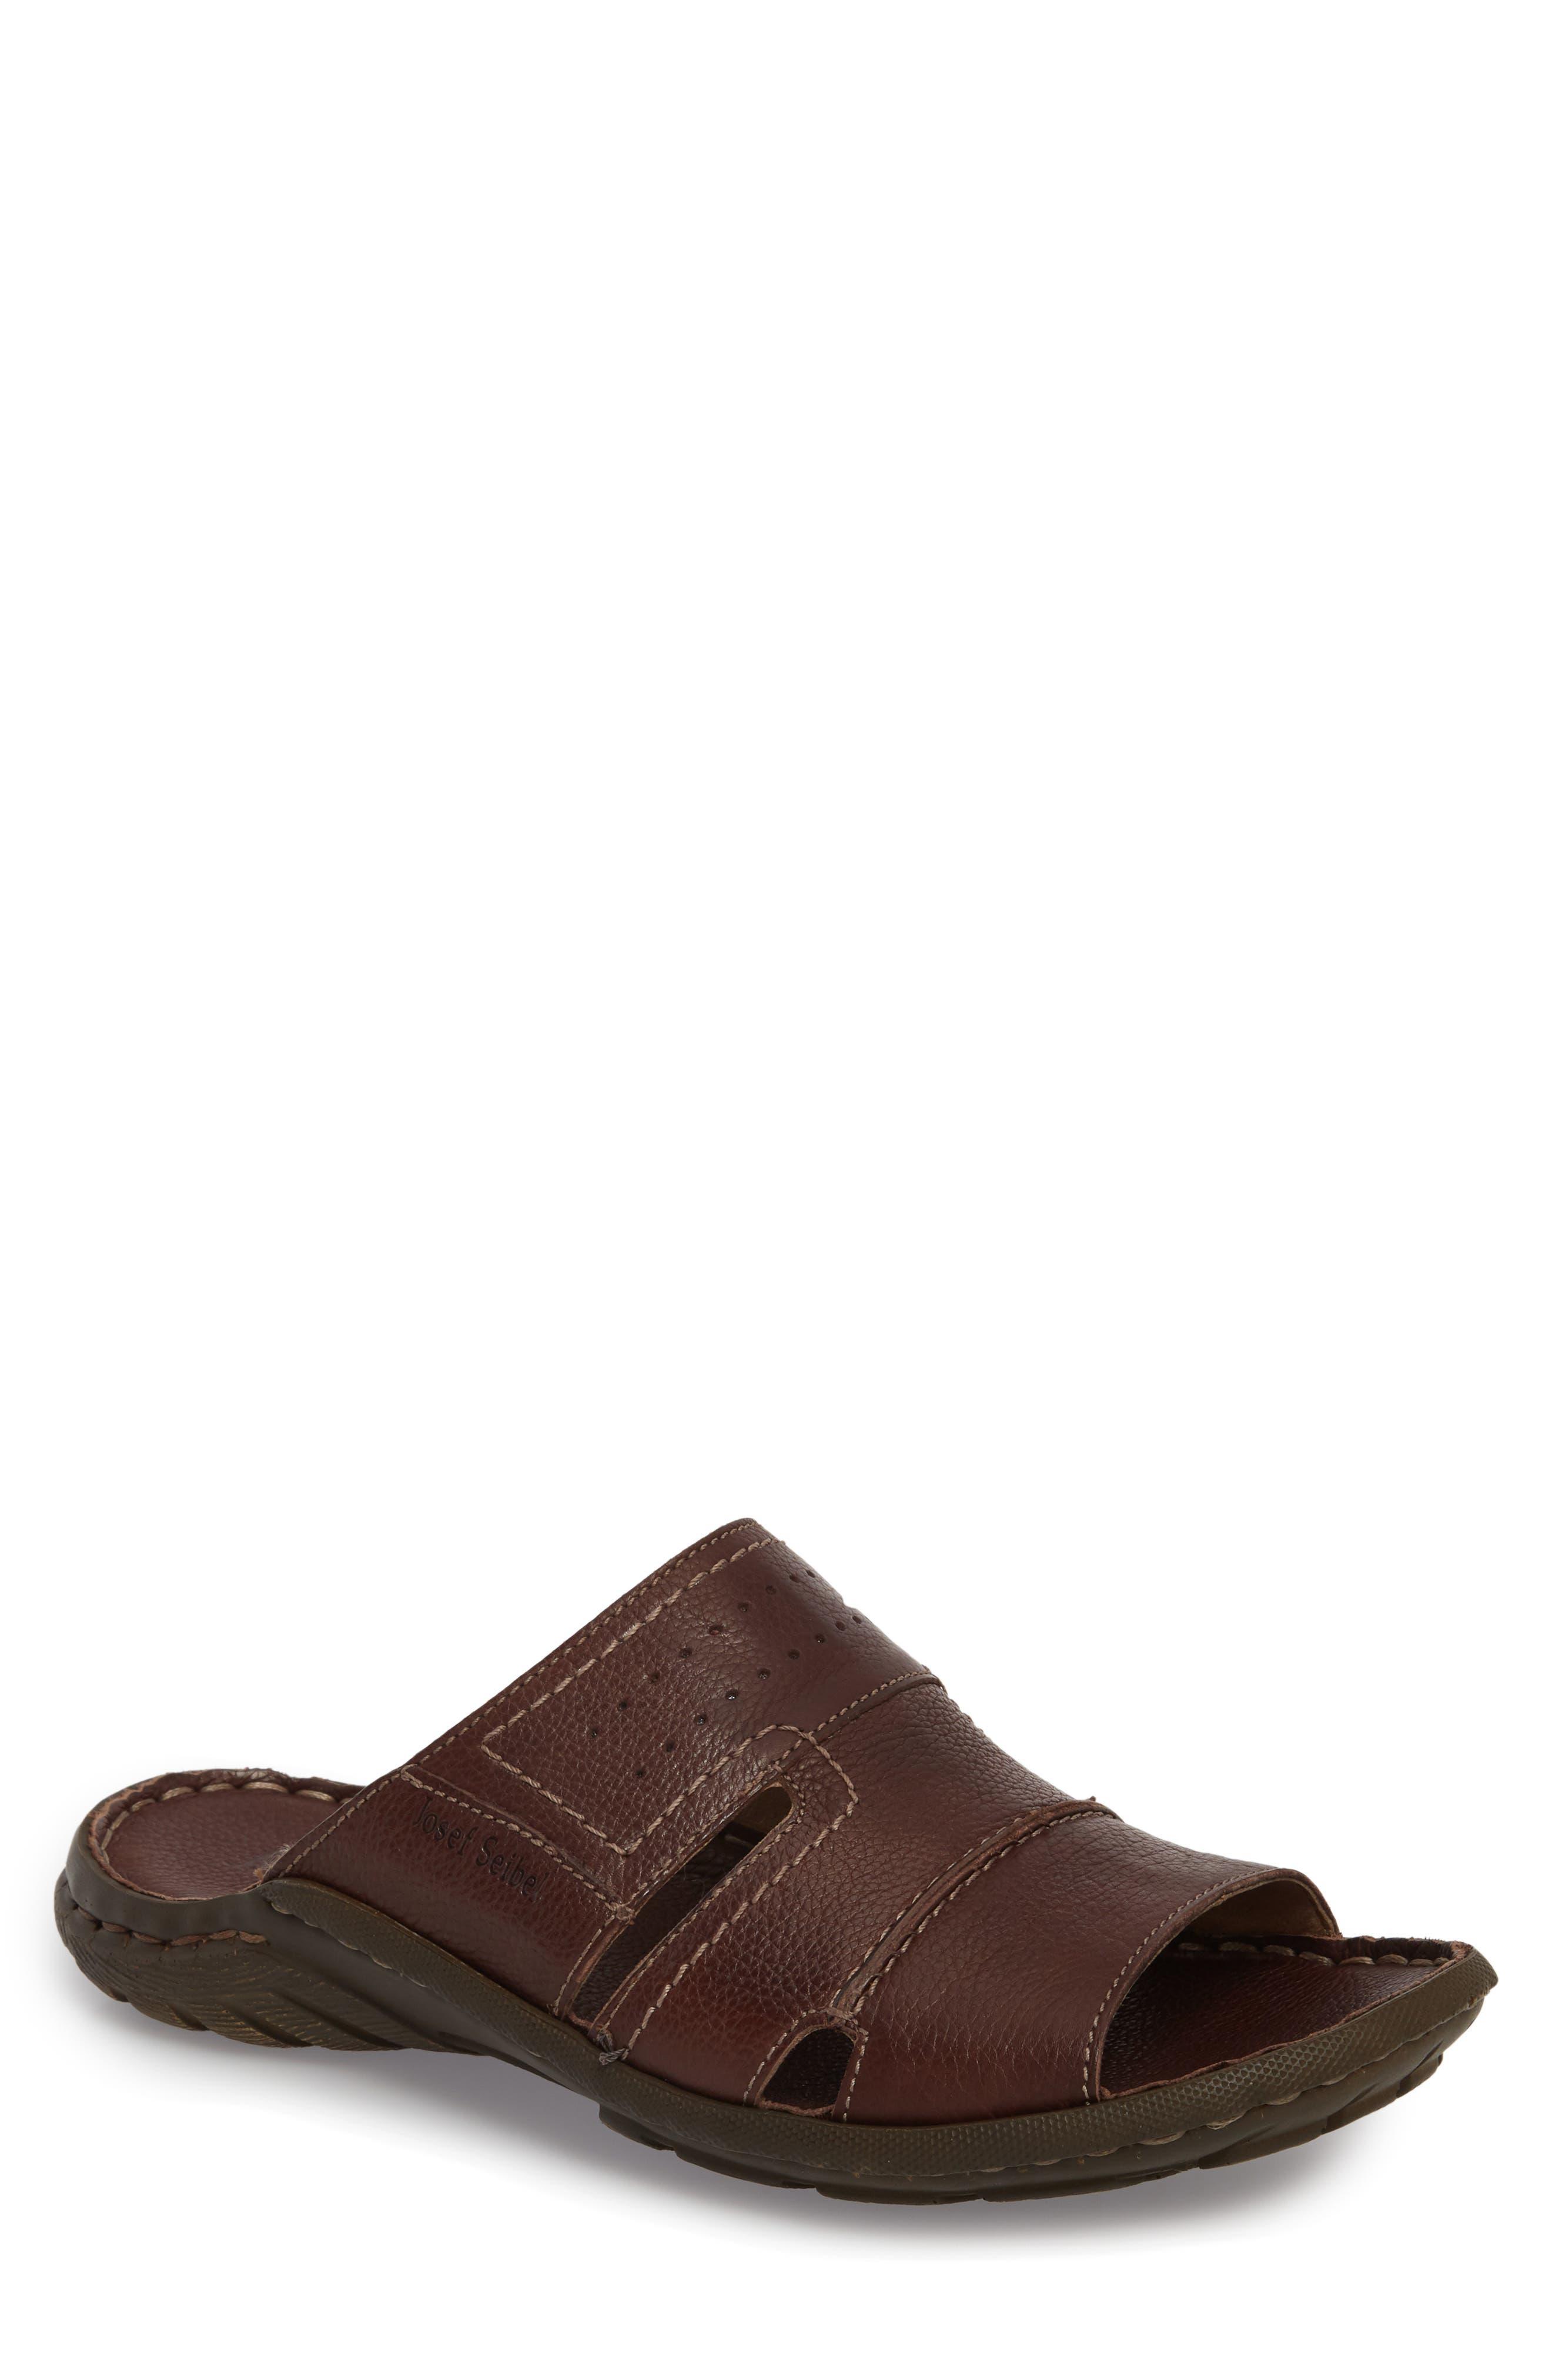 Logan Slide Sandal,                             Main thumbnail 1, color,                             Brown Leather